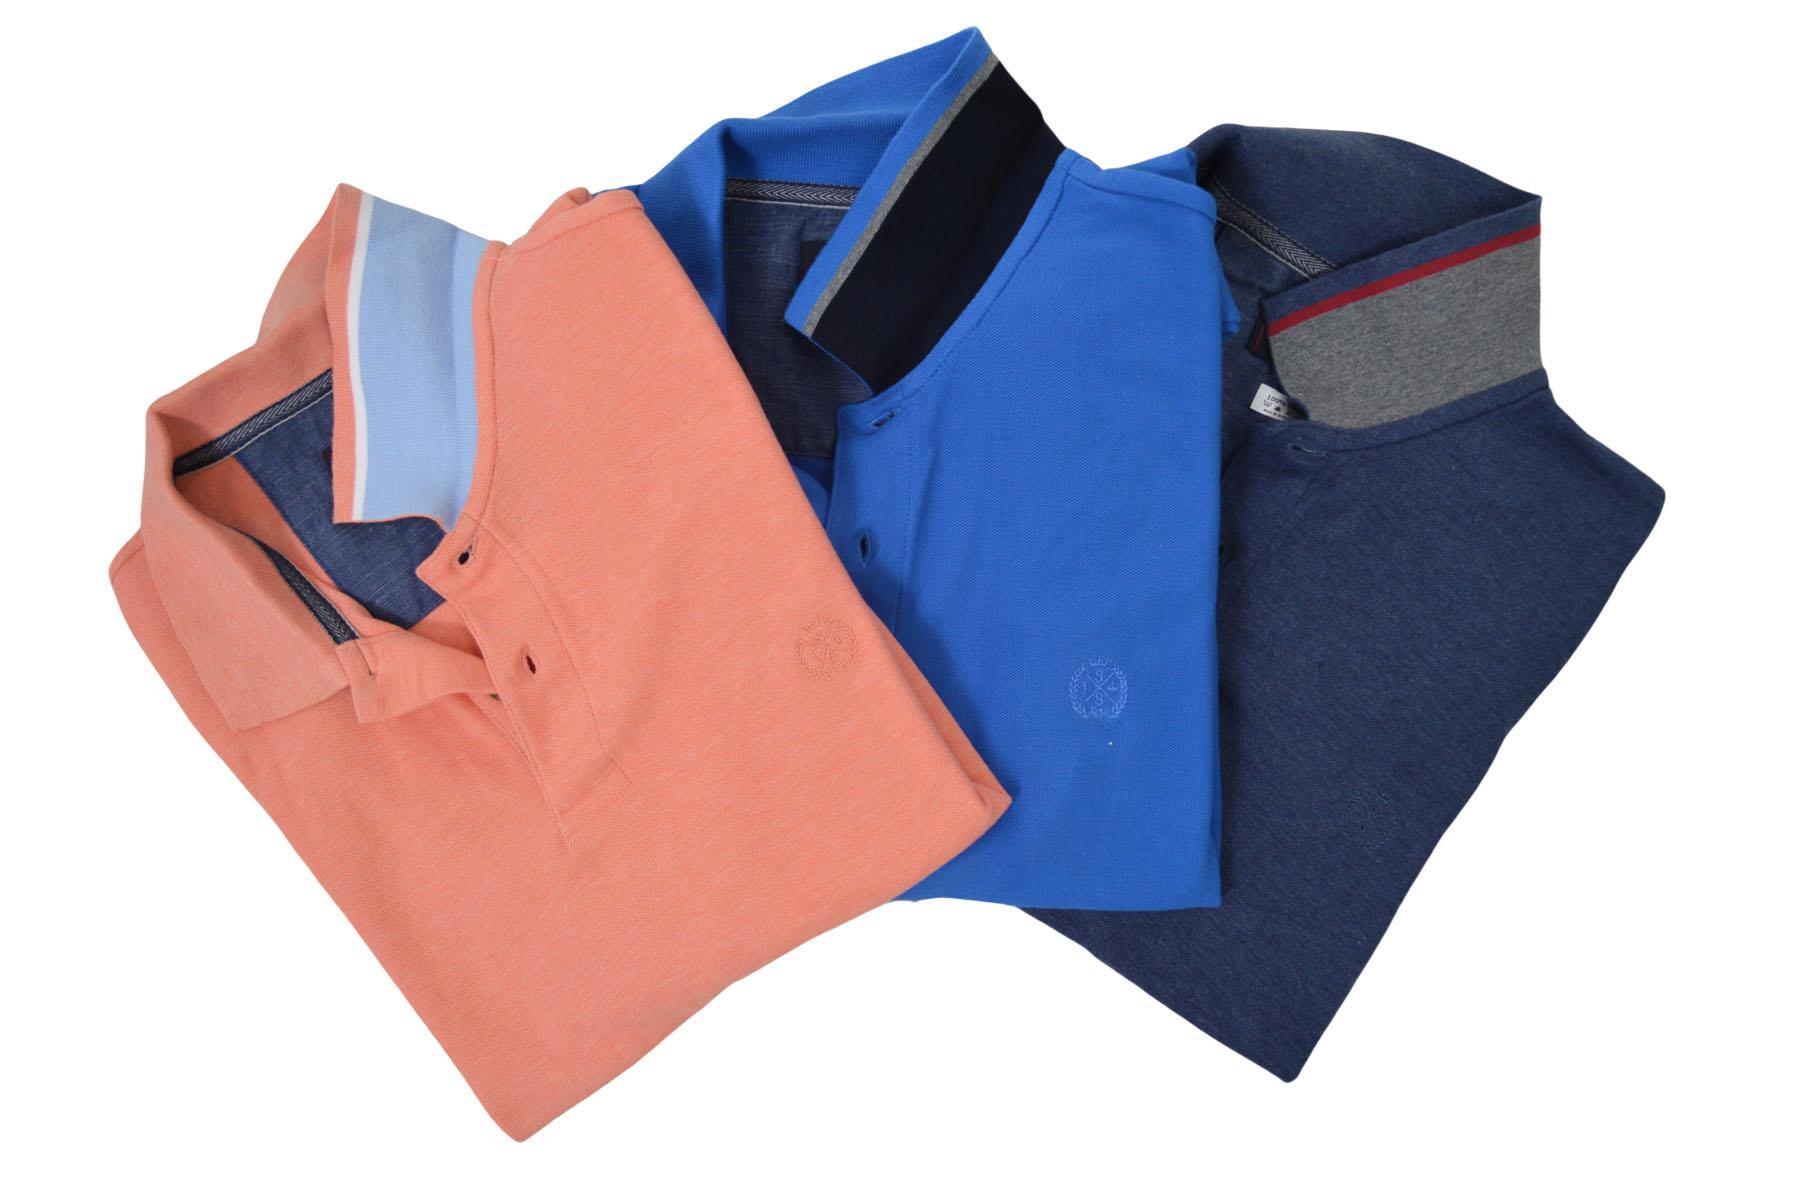 M-amp-S-BLUE-HARBOUR-Camisa-Polo-Para-Hombre-a-Rayas-Contraste-Cuello-Logotipo-Bordado miniatura 4